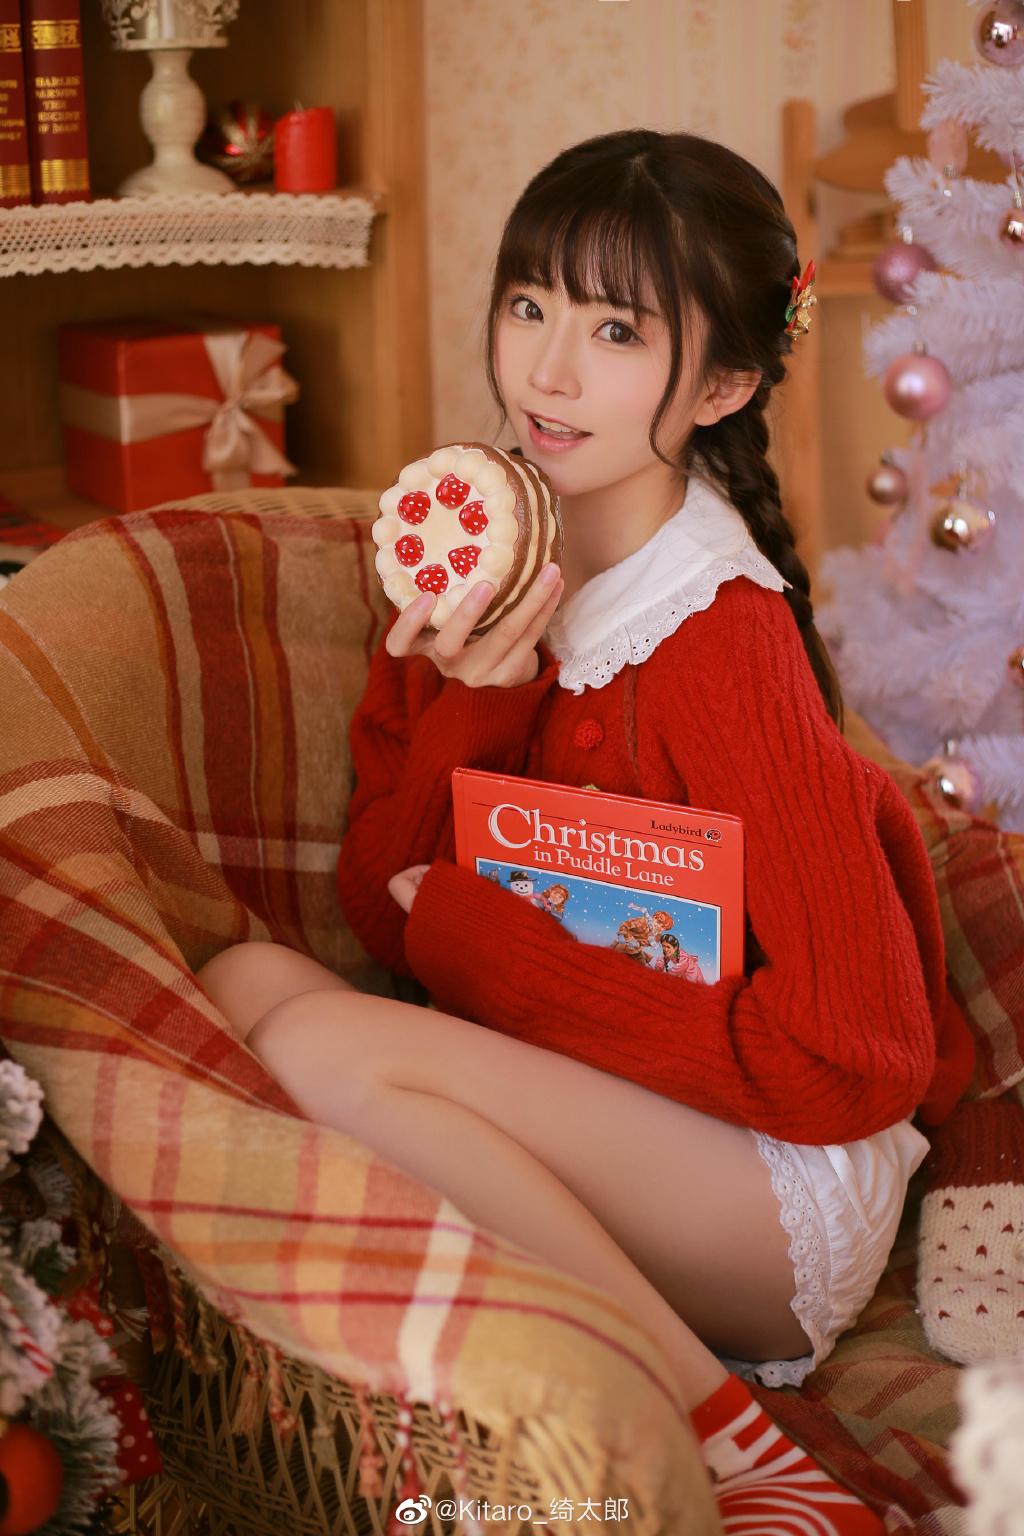 Kitaro_绮太郎圣诞节主题写真